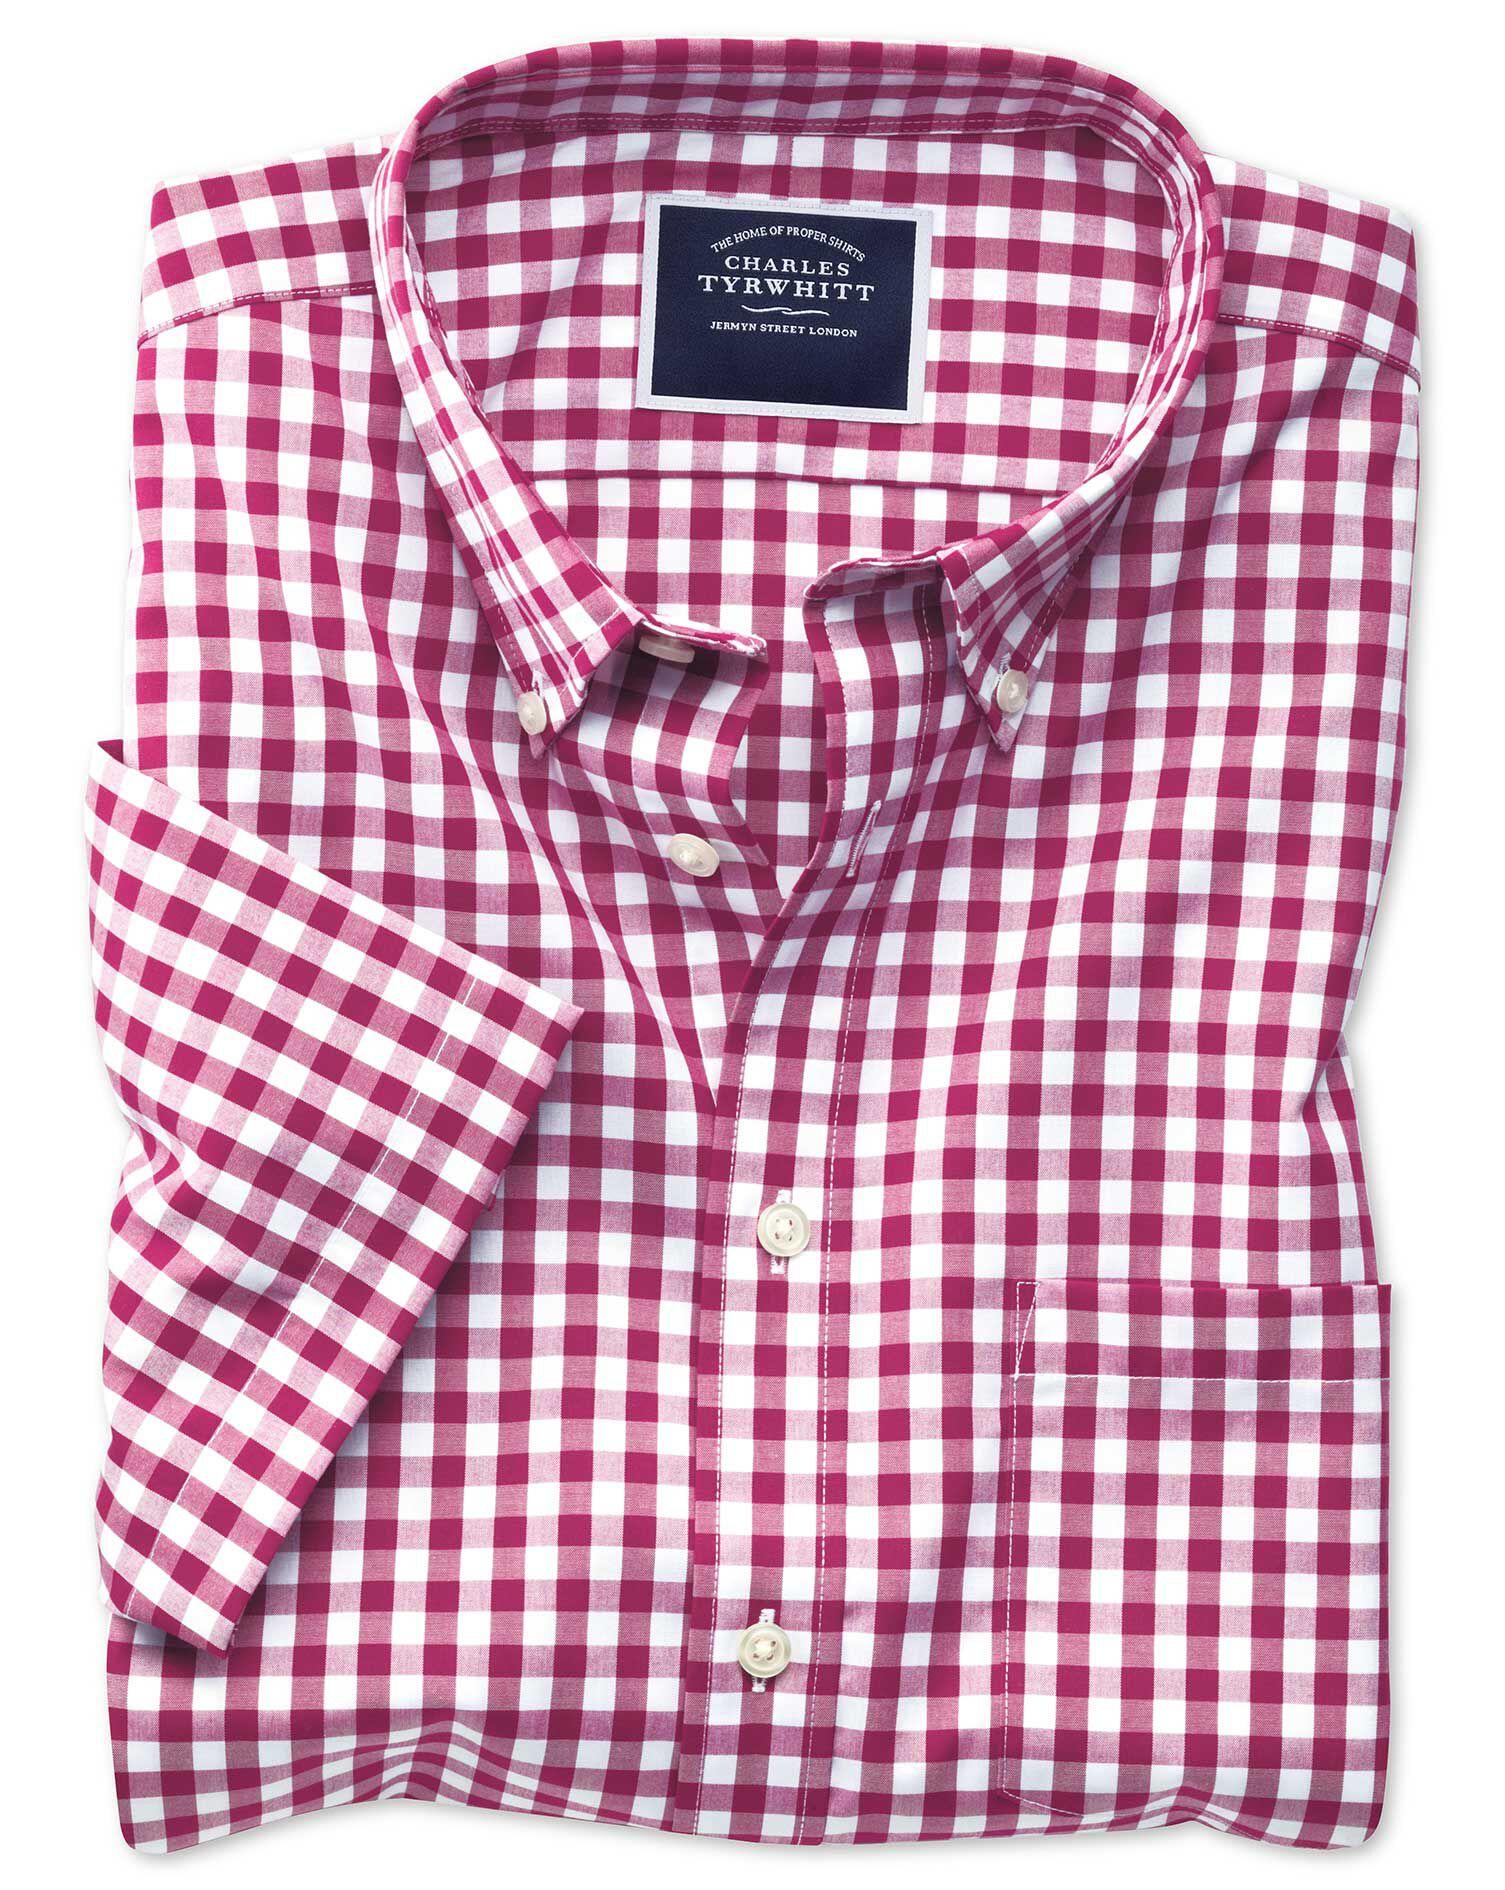 Slim Fit Button-Down Non-Iron Poplin Short Sleeve Raspberry Gingham Cotton Shirt Single Cuff Size XX